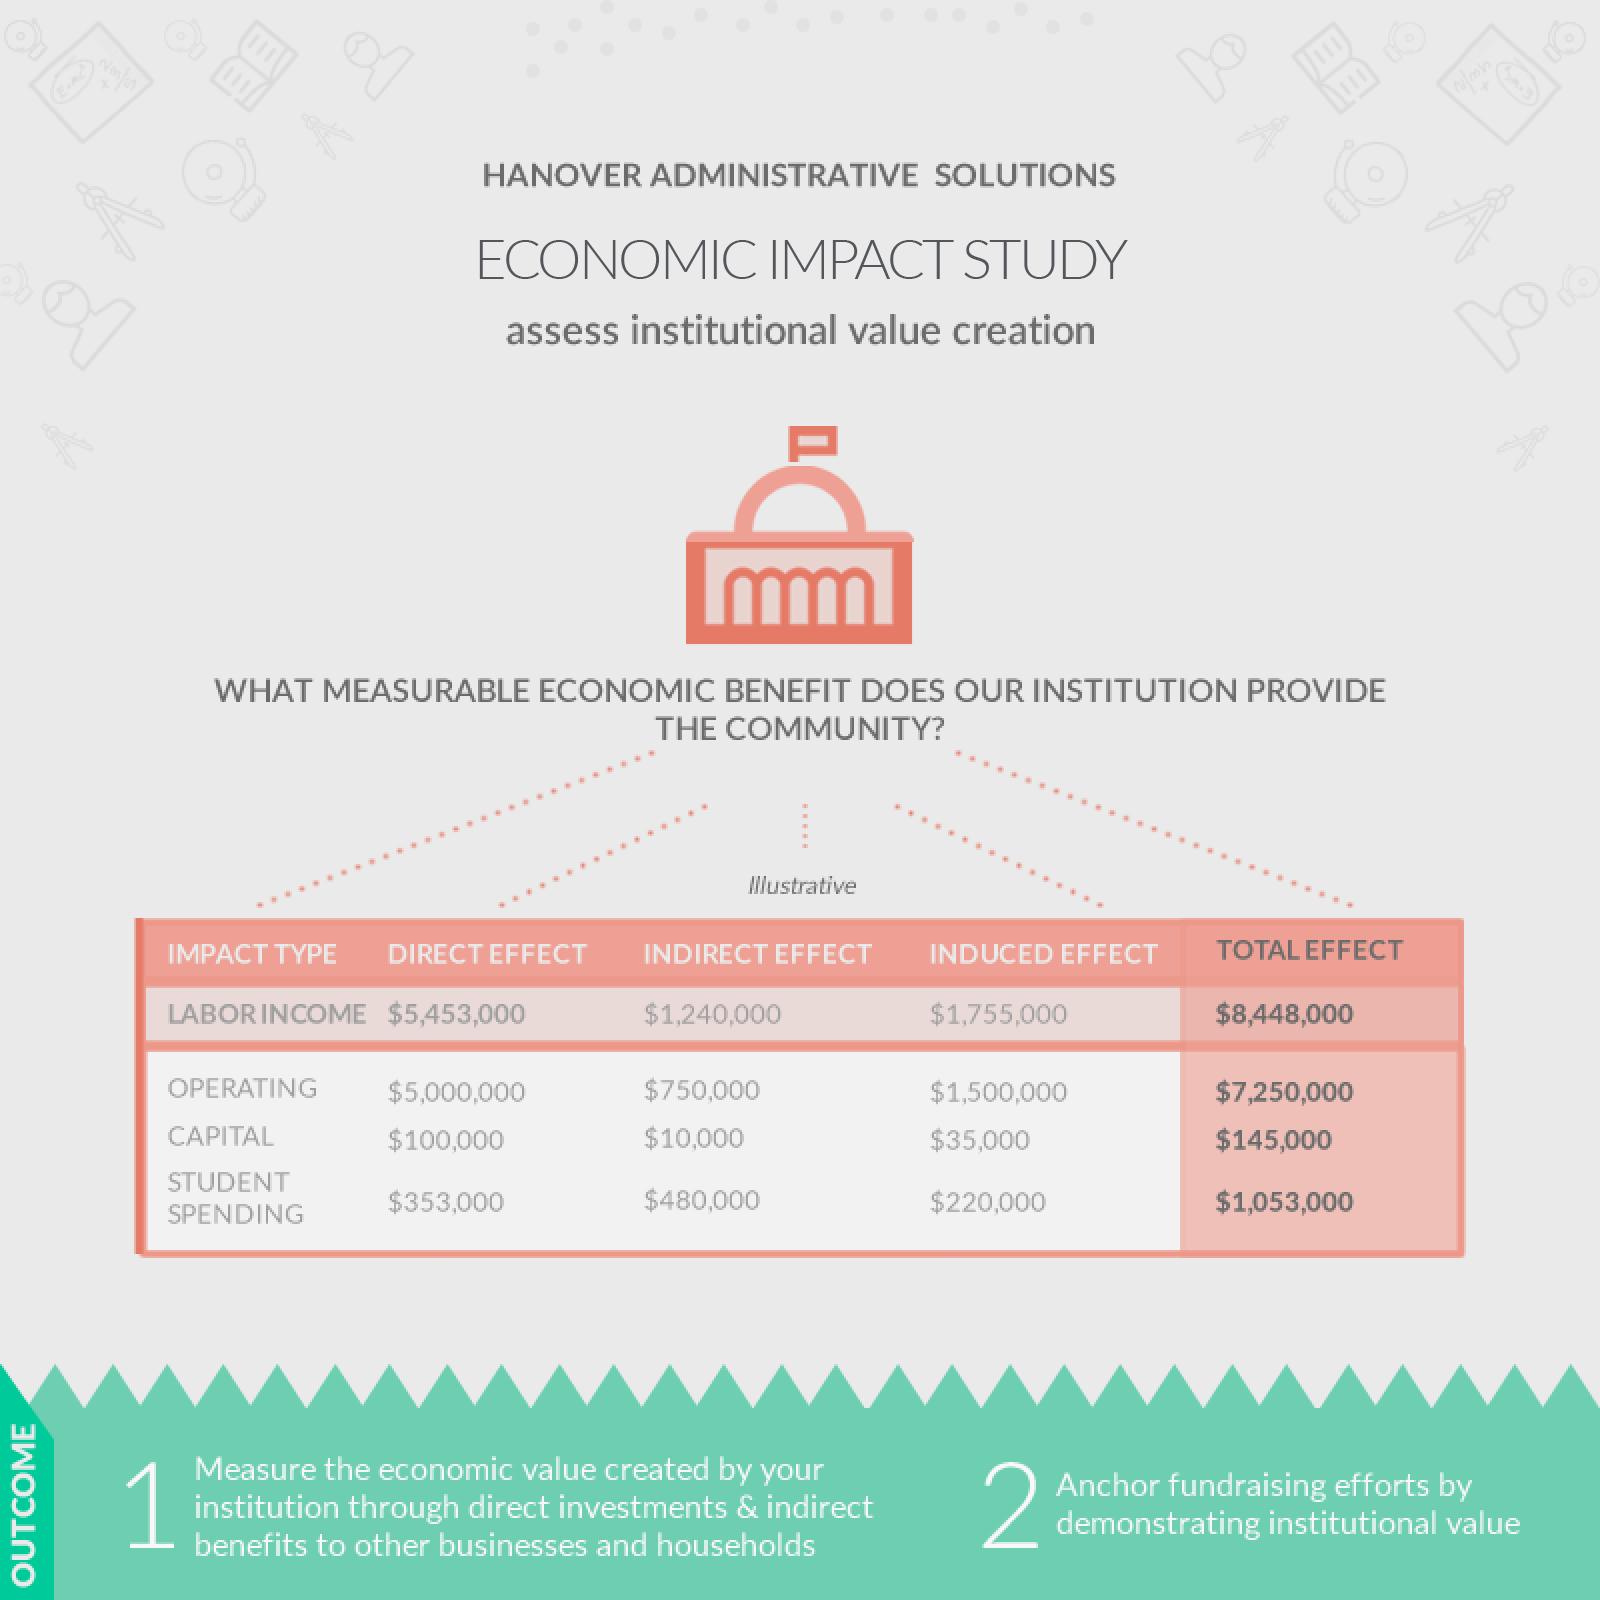 screenshot: economic impact study